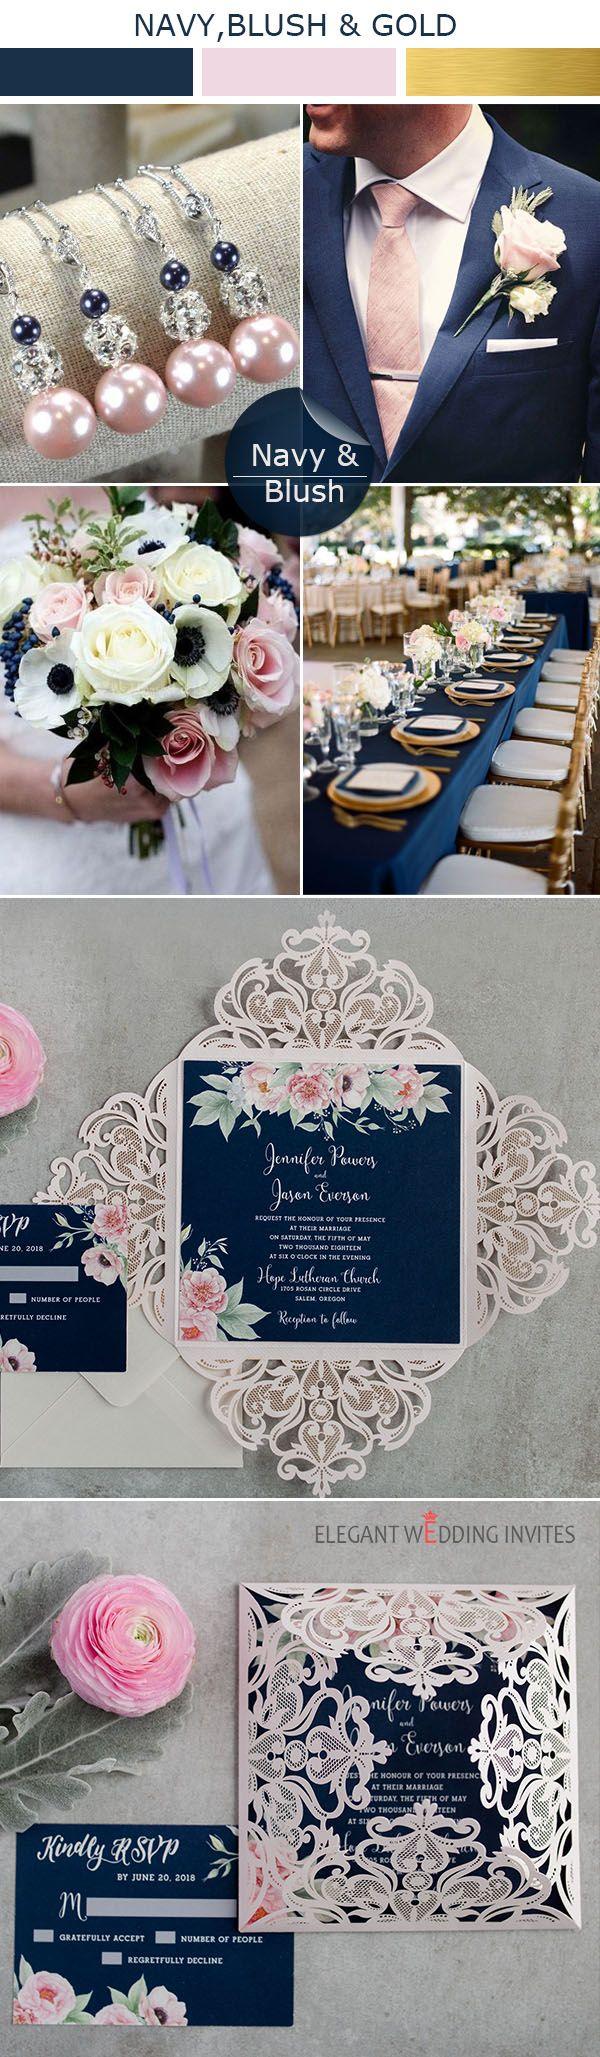 New navy and blush laser cut wedding invitations. #weddings #invitations #navy #elegantweddinginvites #weddingcolors